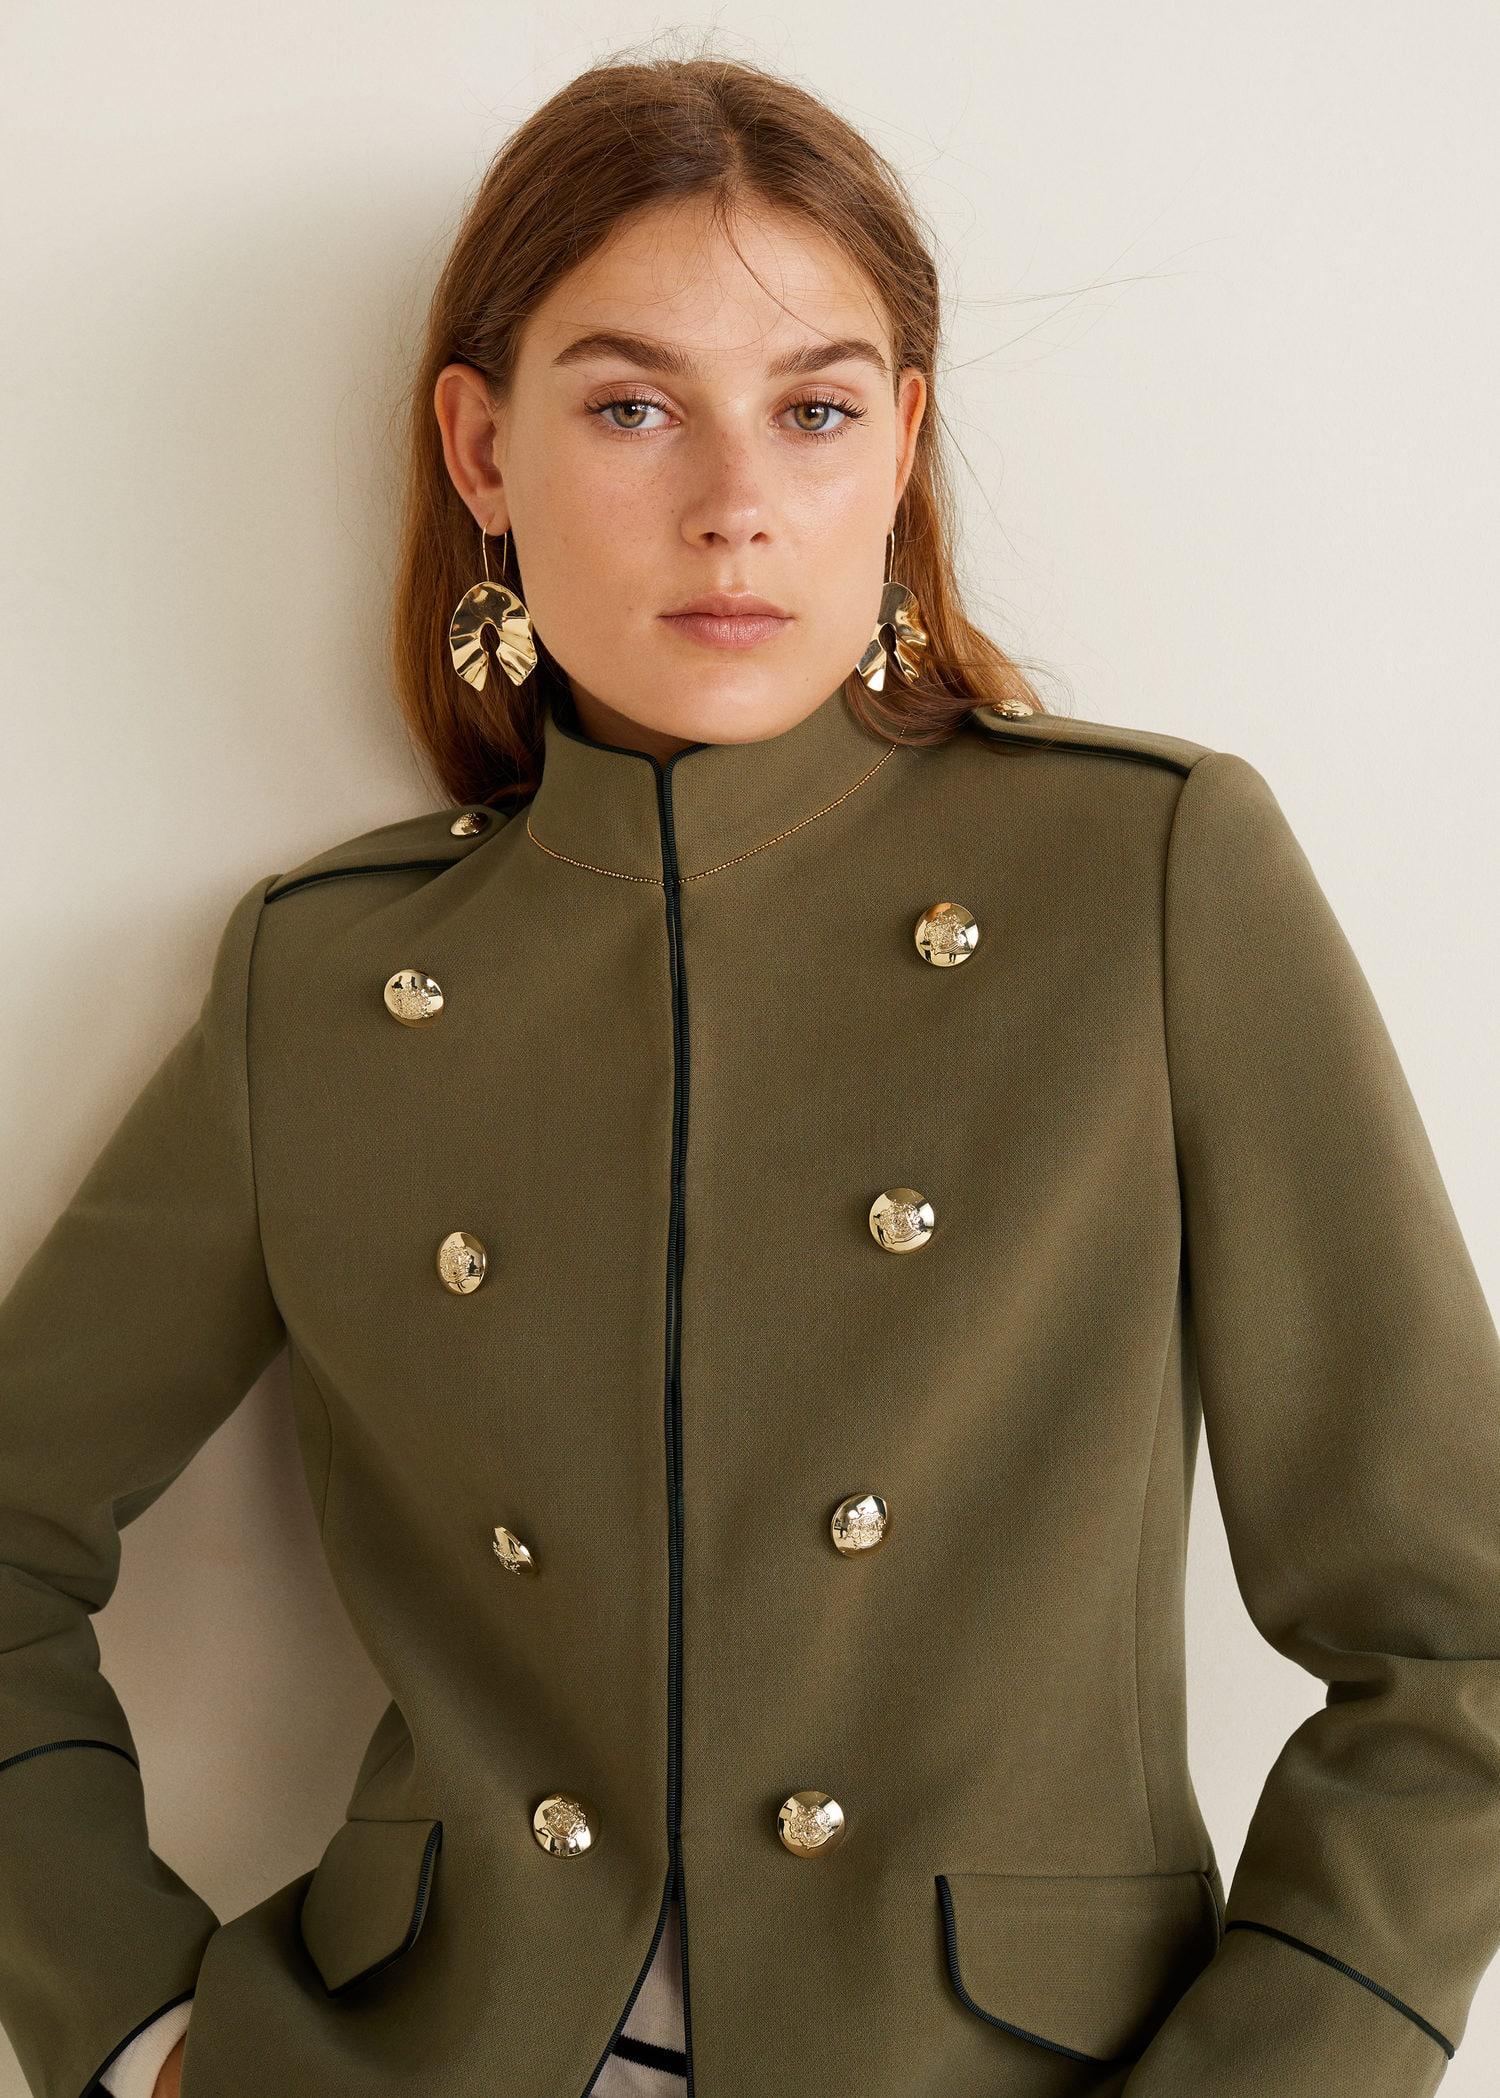 Chaqueta Mujer militar estilo abalorios MANGO España q8TApqwx